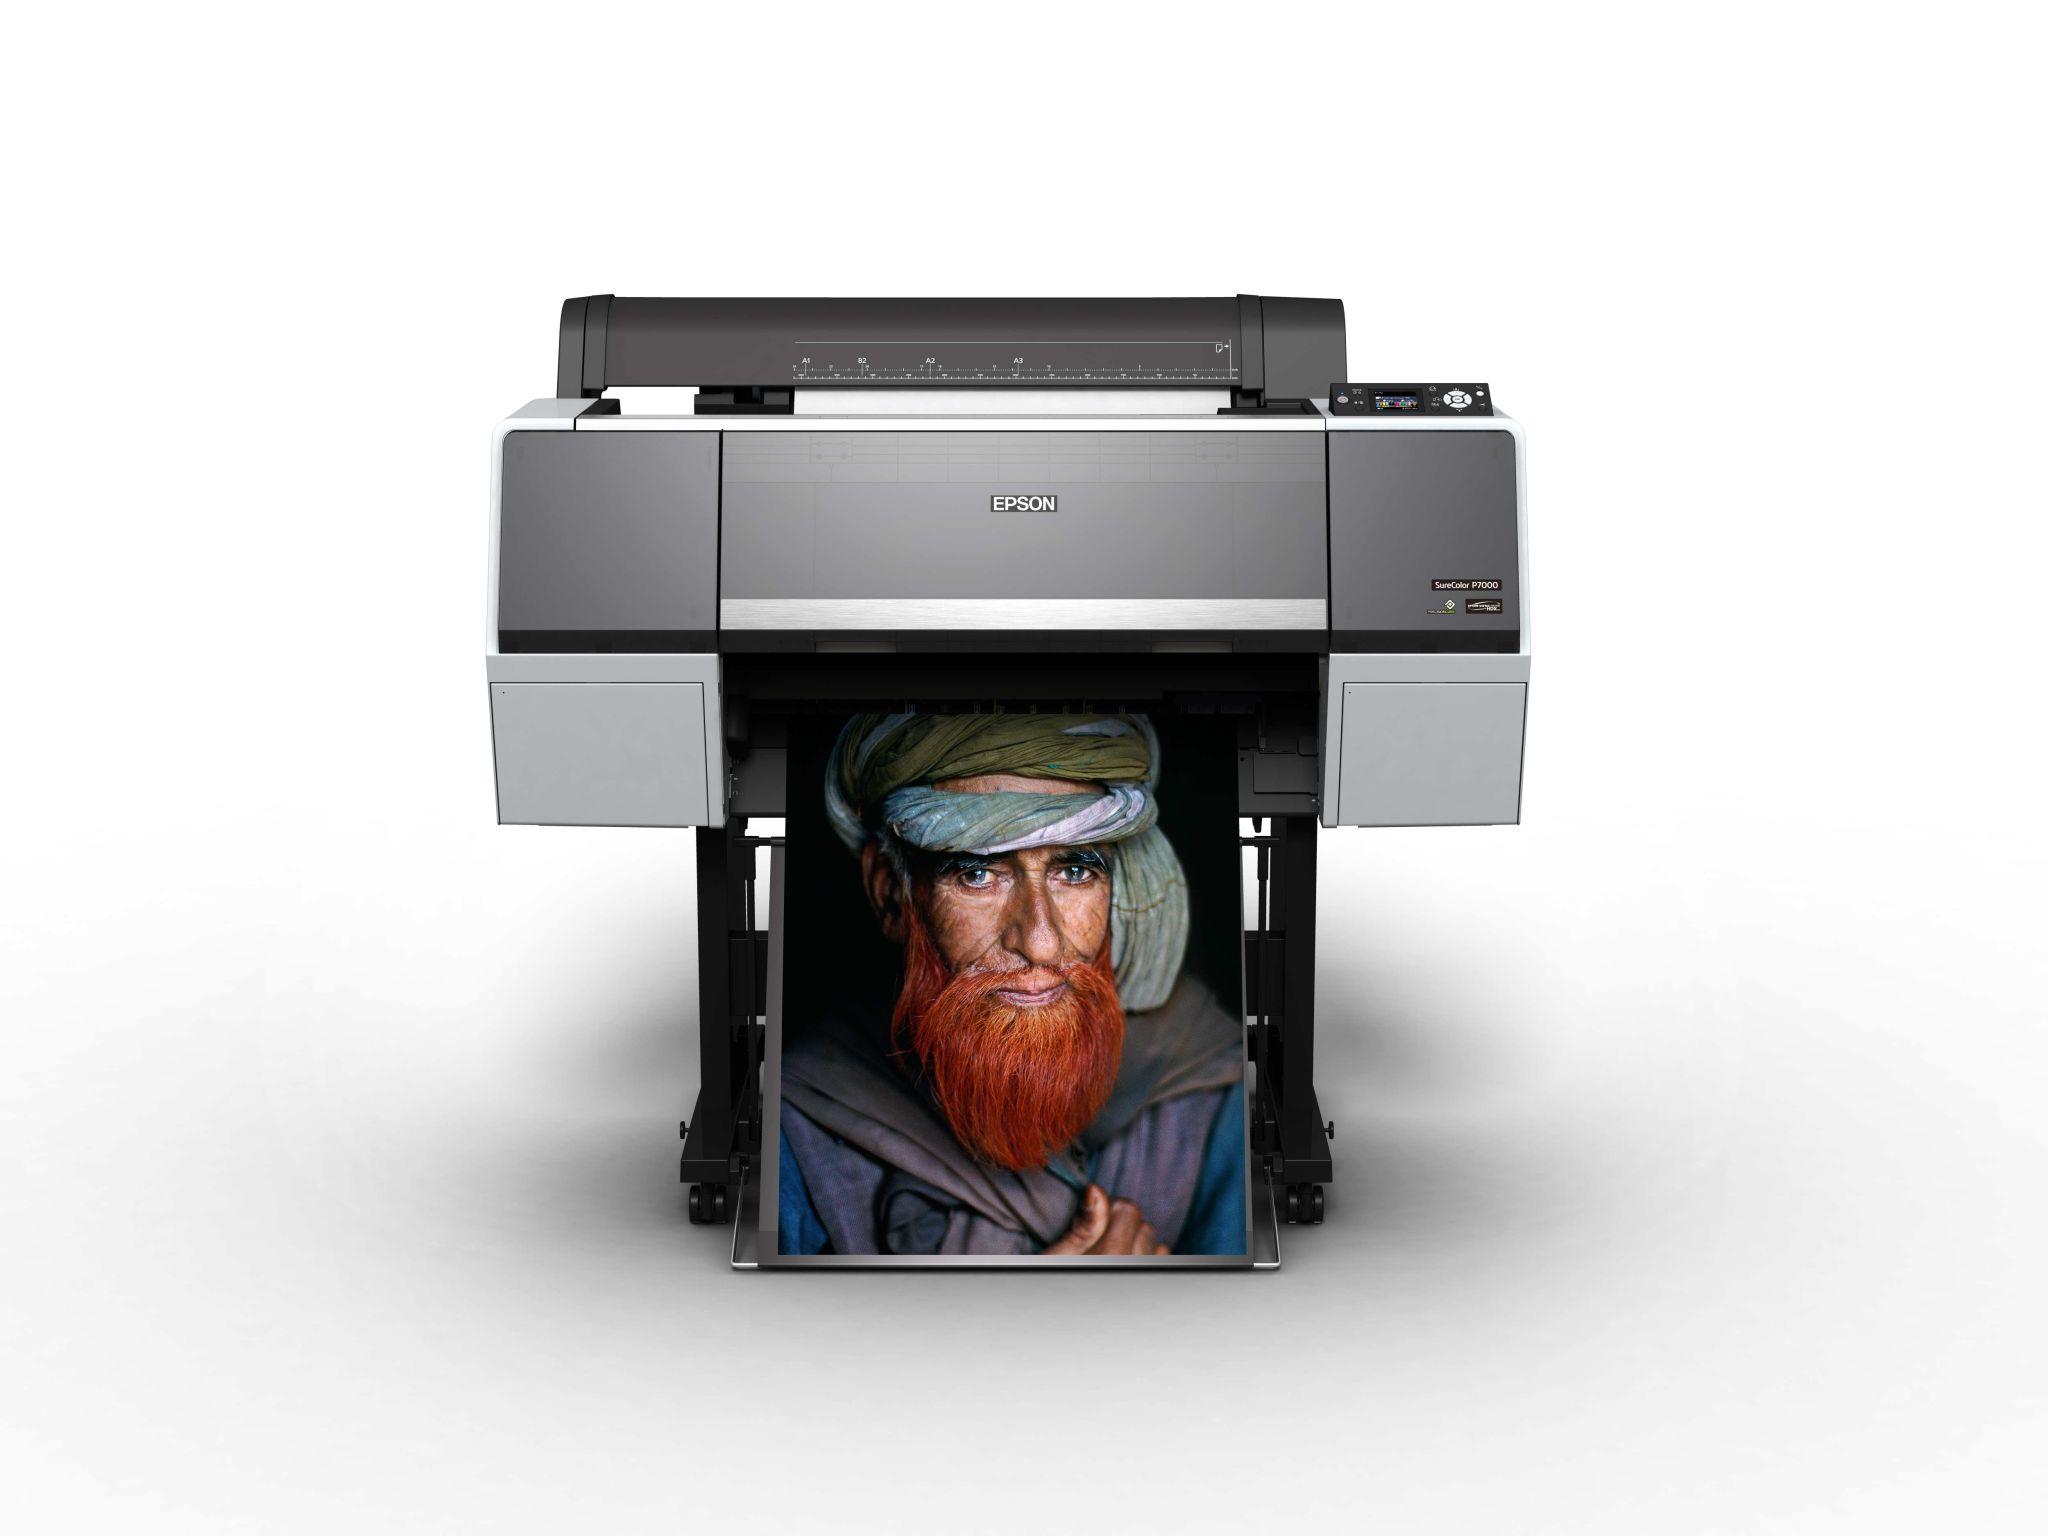 Professional Photo Printing Photo Gifts Nations Photo Lab Print labs for professional photographers